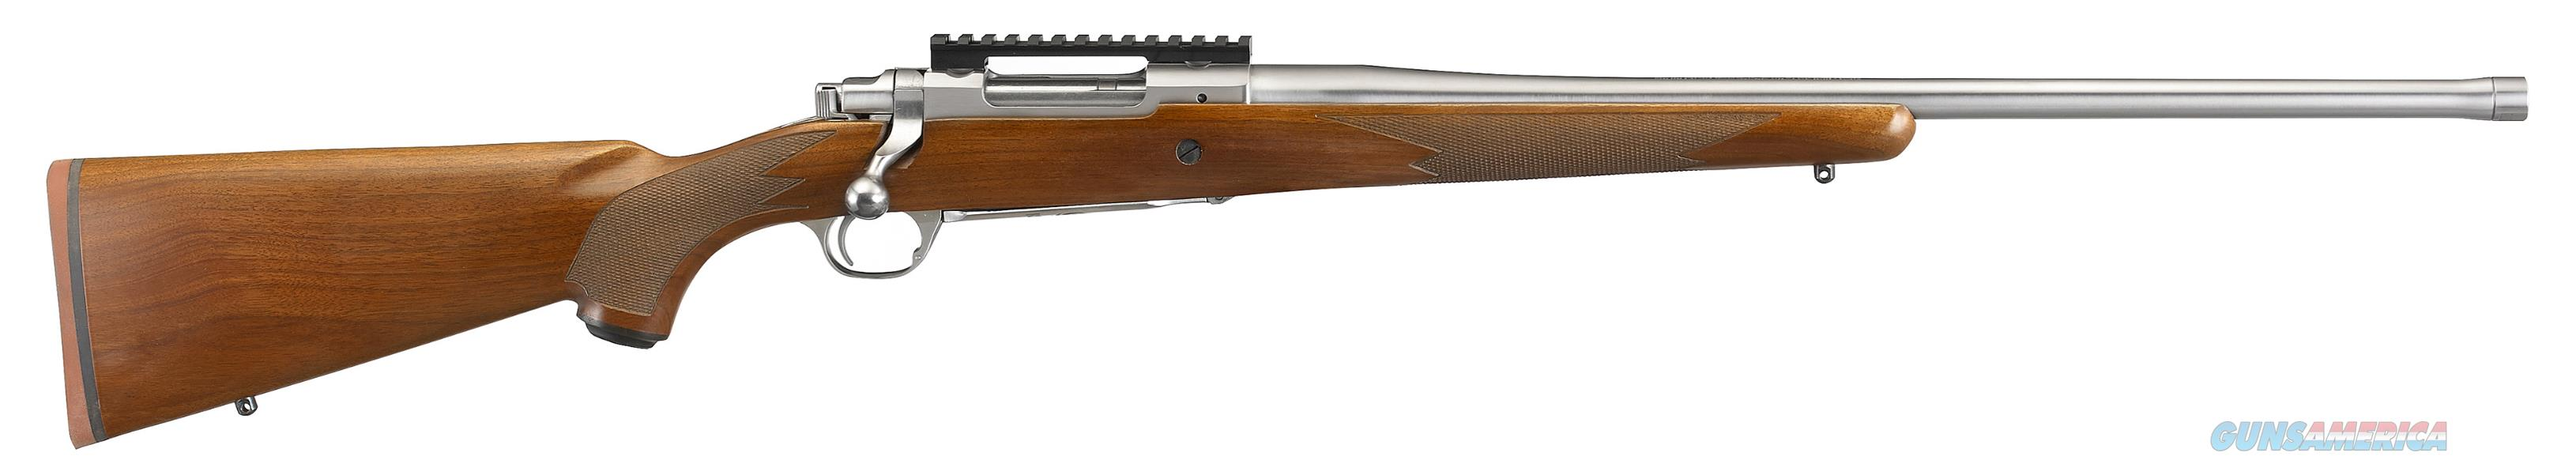 Ruger Hawkeye, Rug 57124 Hawkeye Hunter   7mm Mg 24 Wal Satin Ss  Guns > Pistols > 1911 Pistol Copies (non-Colt)